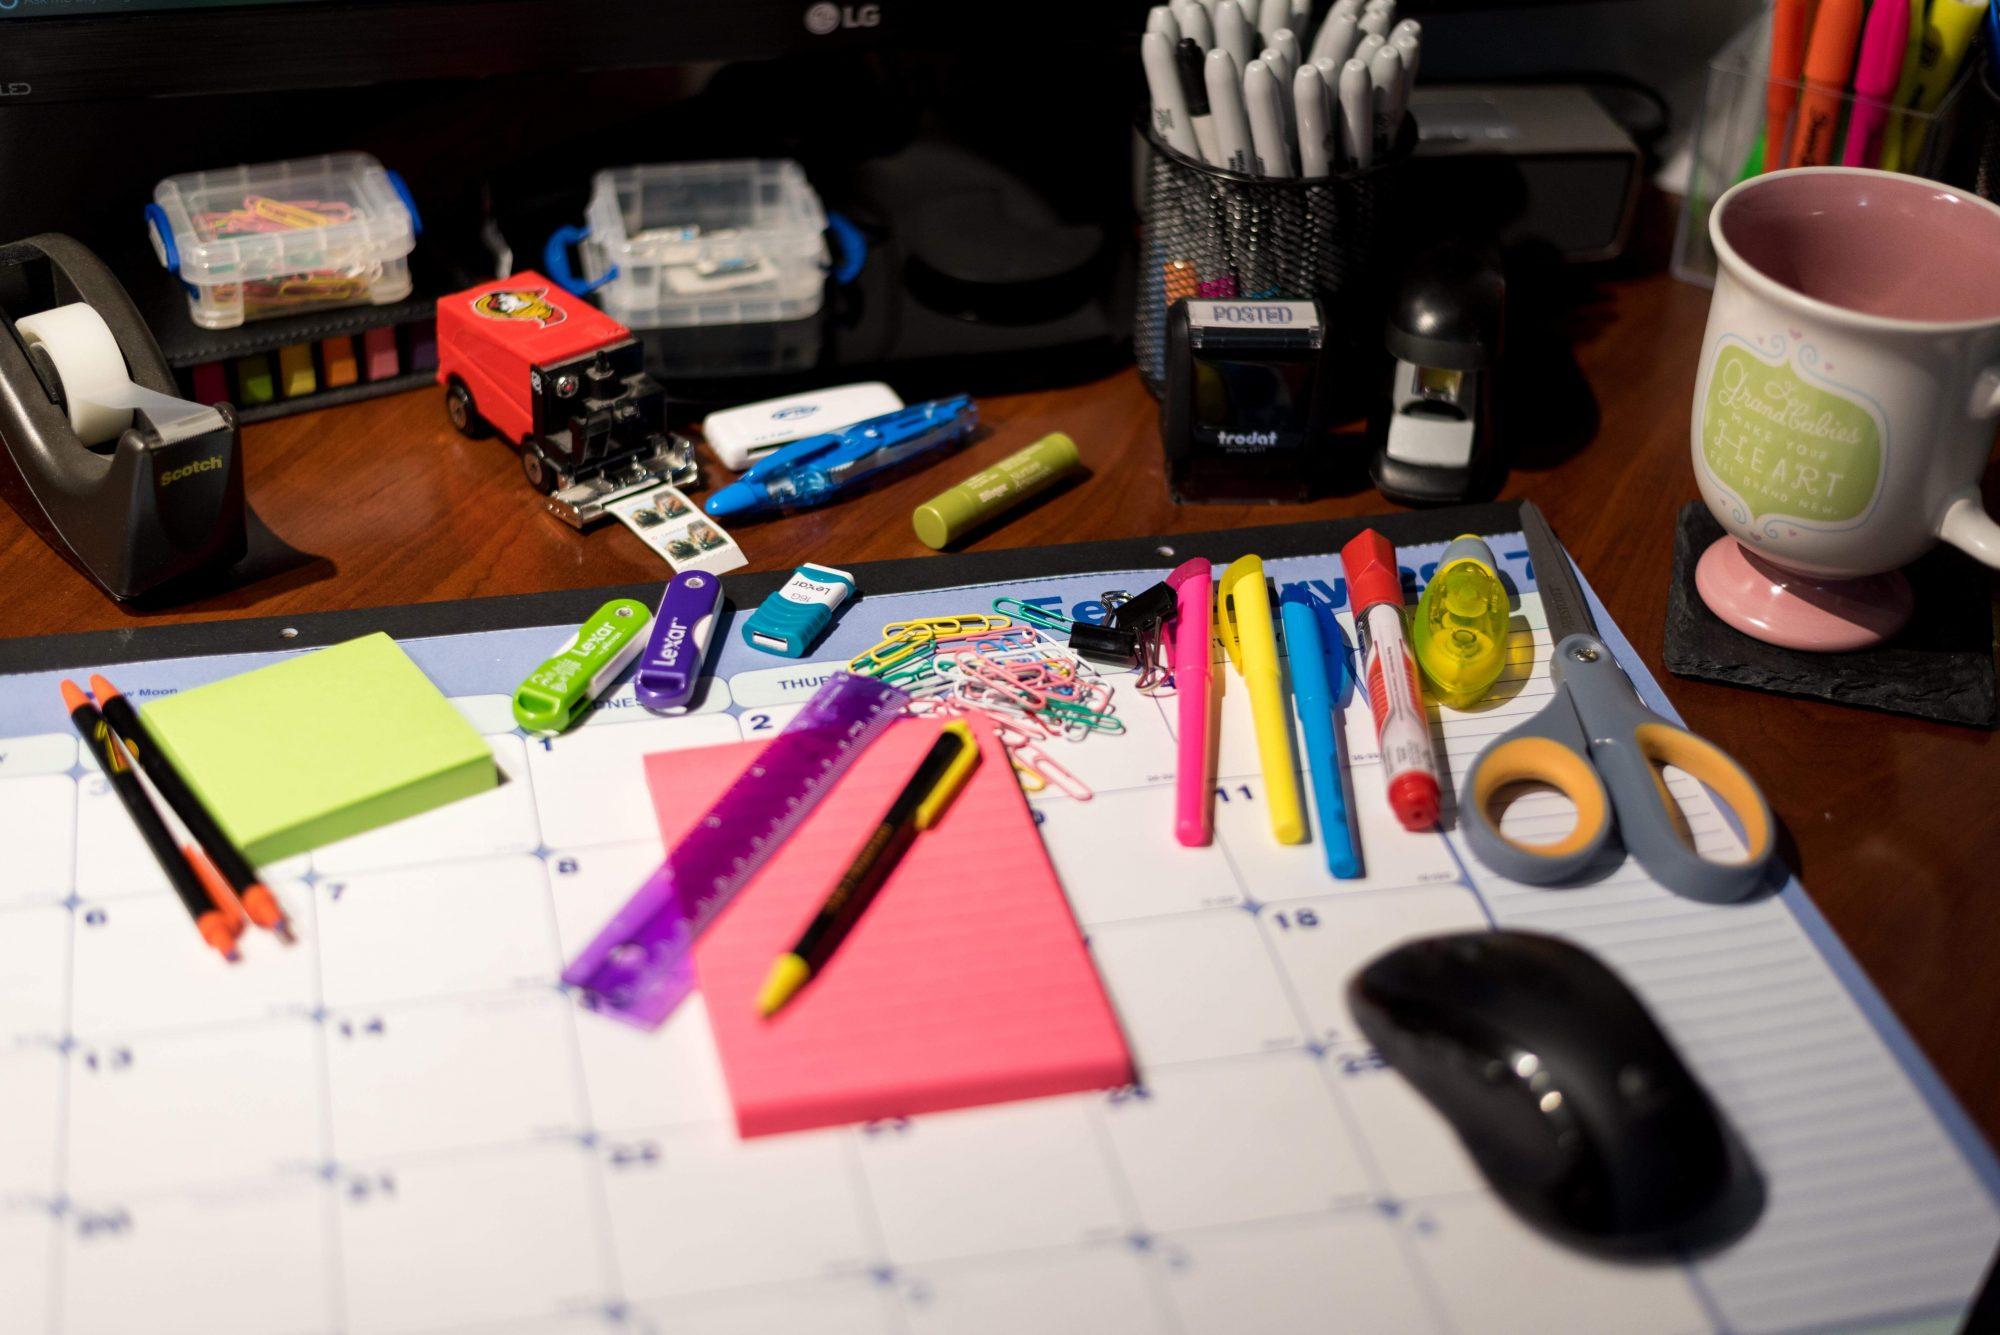 The Best Ways to Keep Wedding Planning Organized